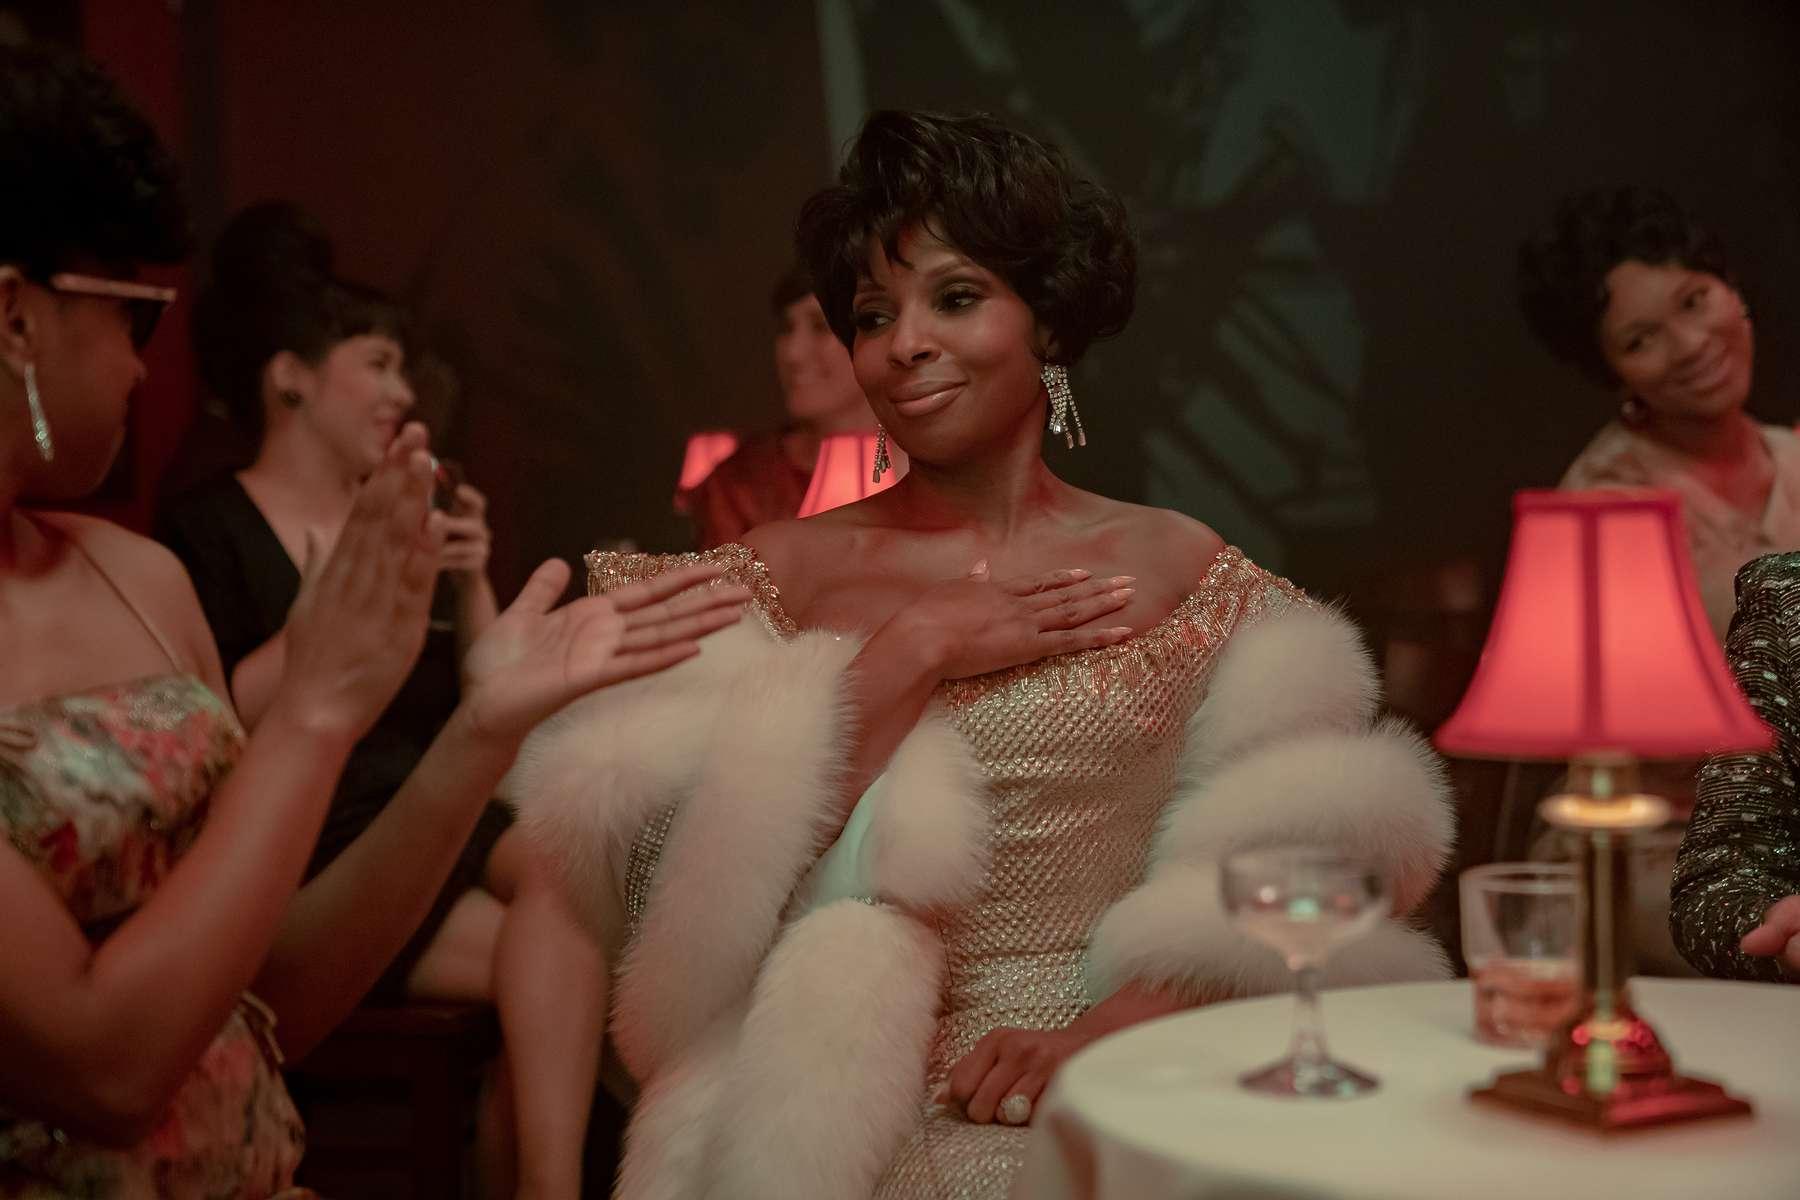 R_08762_RMary J. Blige stars as Dinah Washington inRESPECT, A Metro Goldwyn Mayer Pictures filmPhoto credit: Quantrell D. Colbert